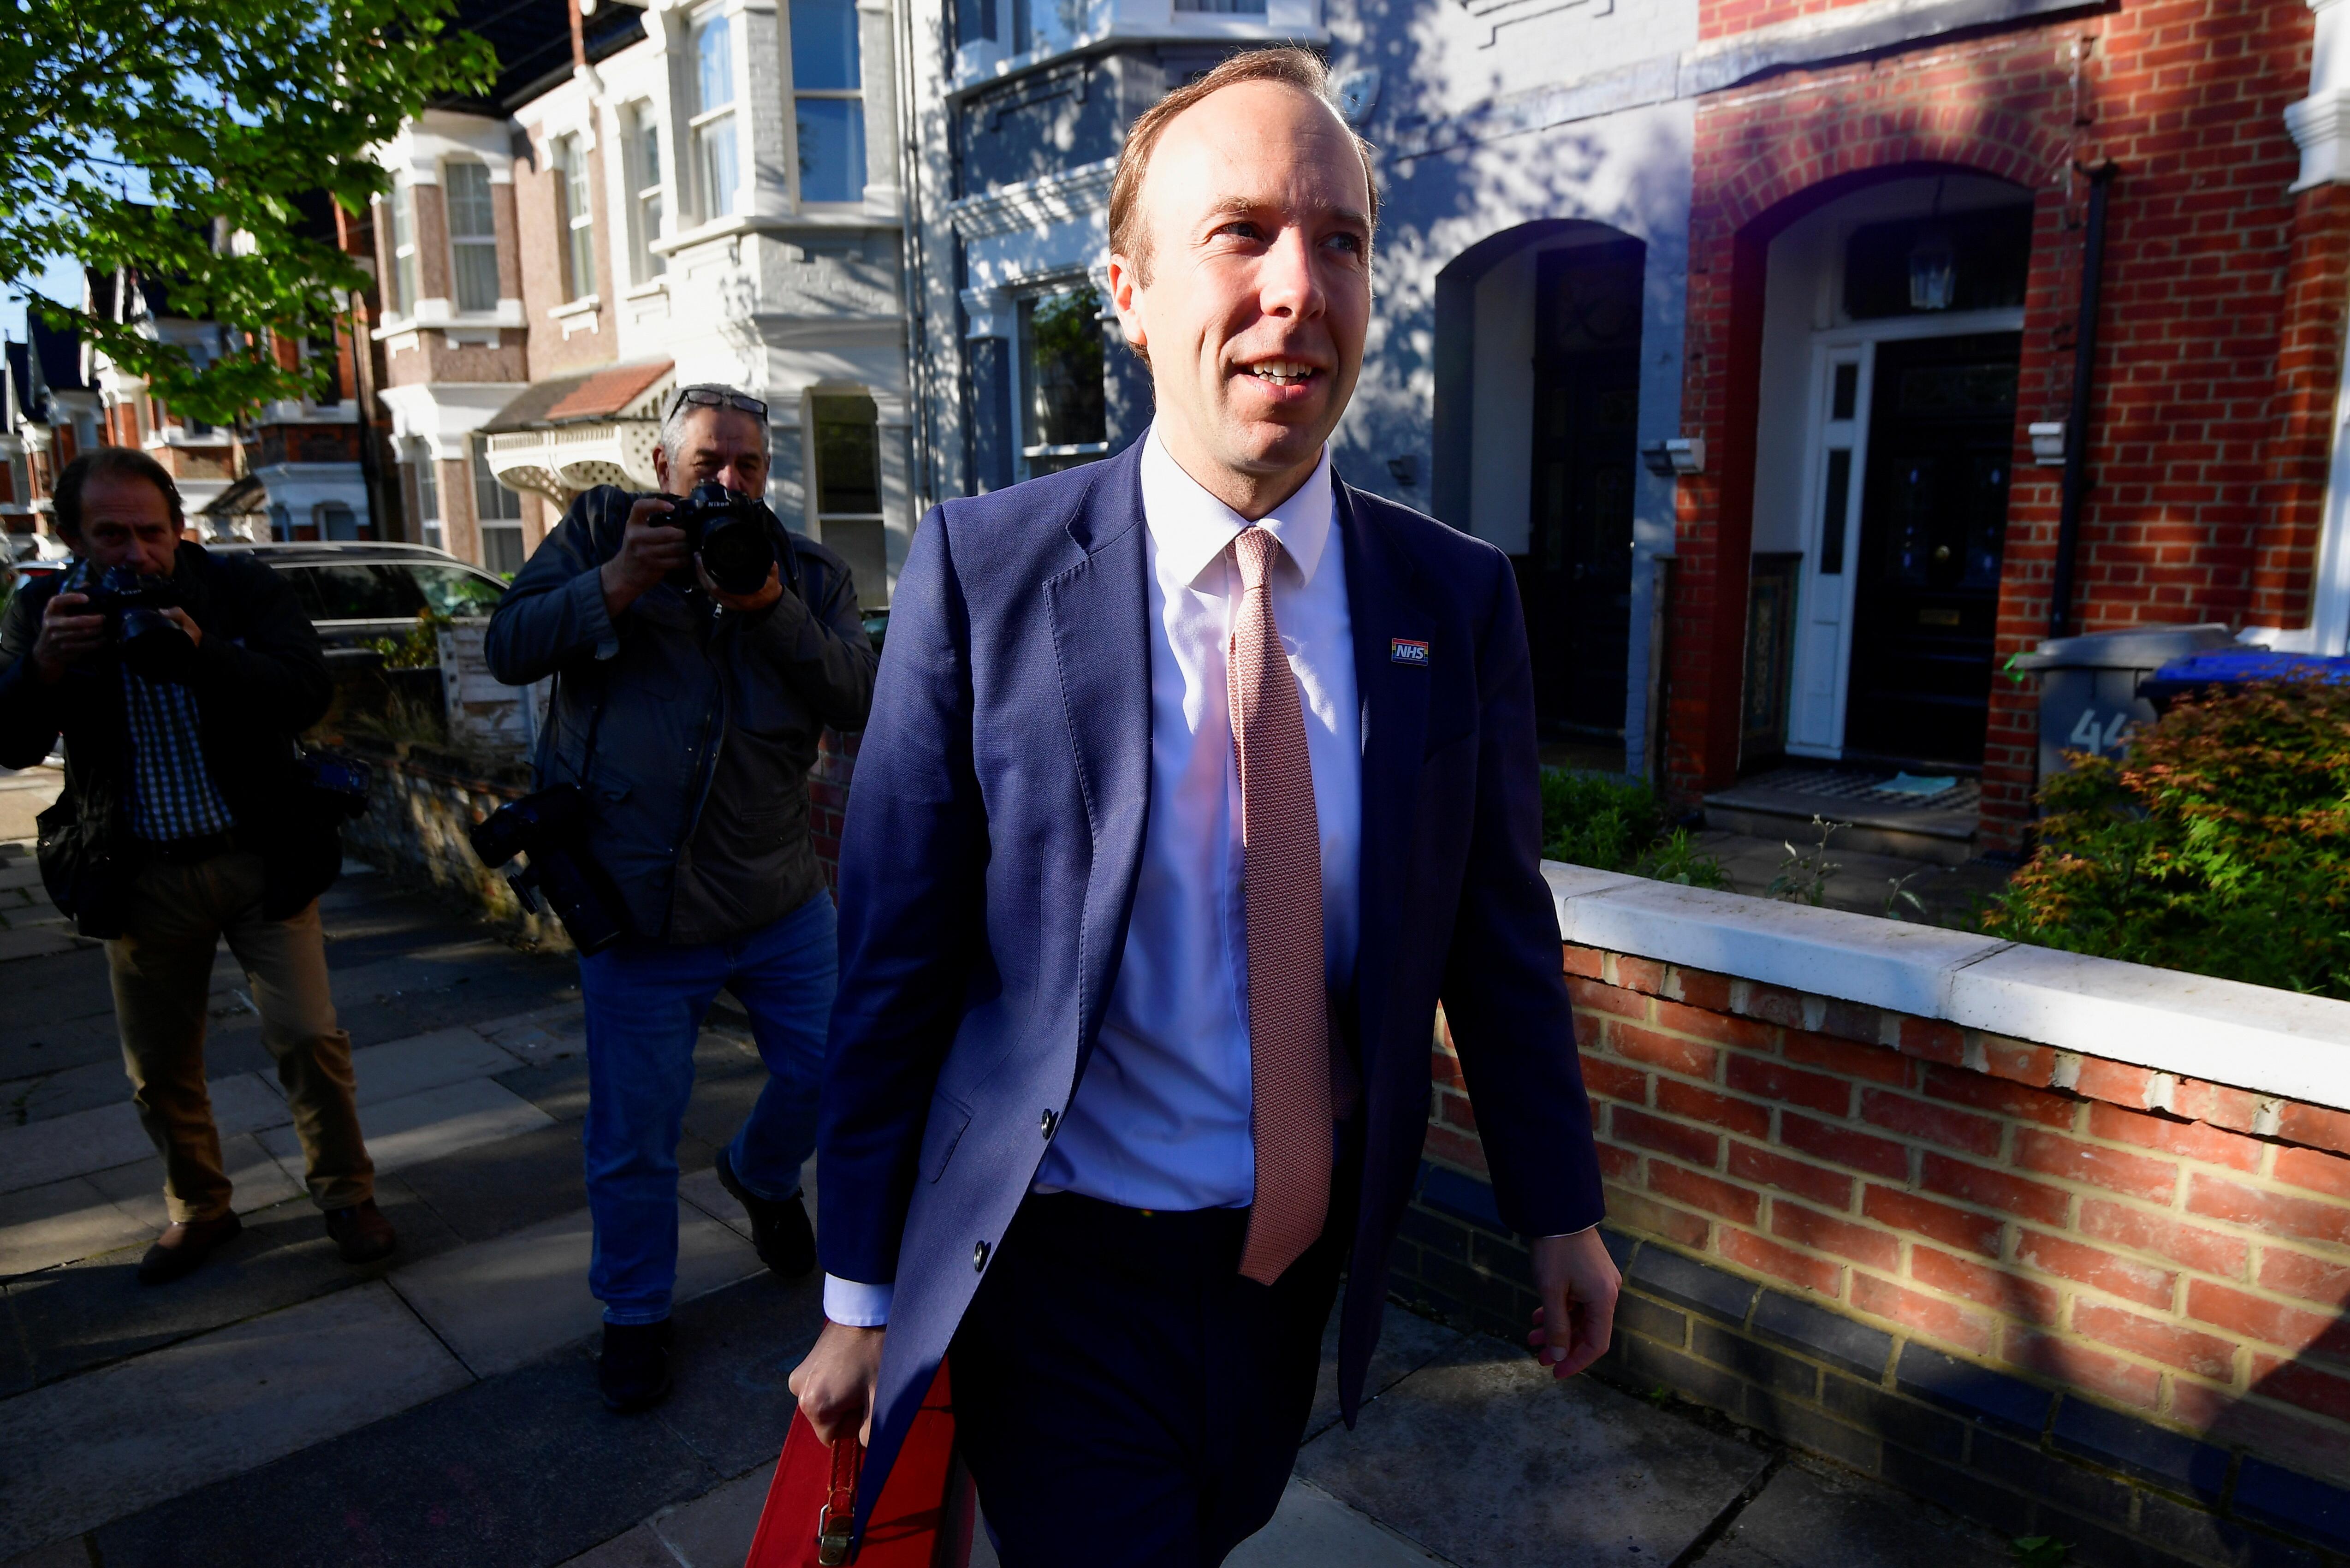 Britain's Health Secretary Matt Hancock leaves his house, in London, Britain May 27, 2021. REUTERS/Toby Melville